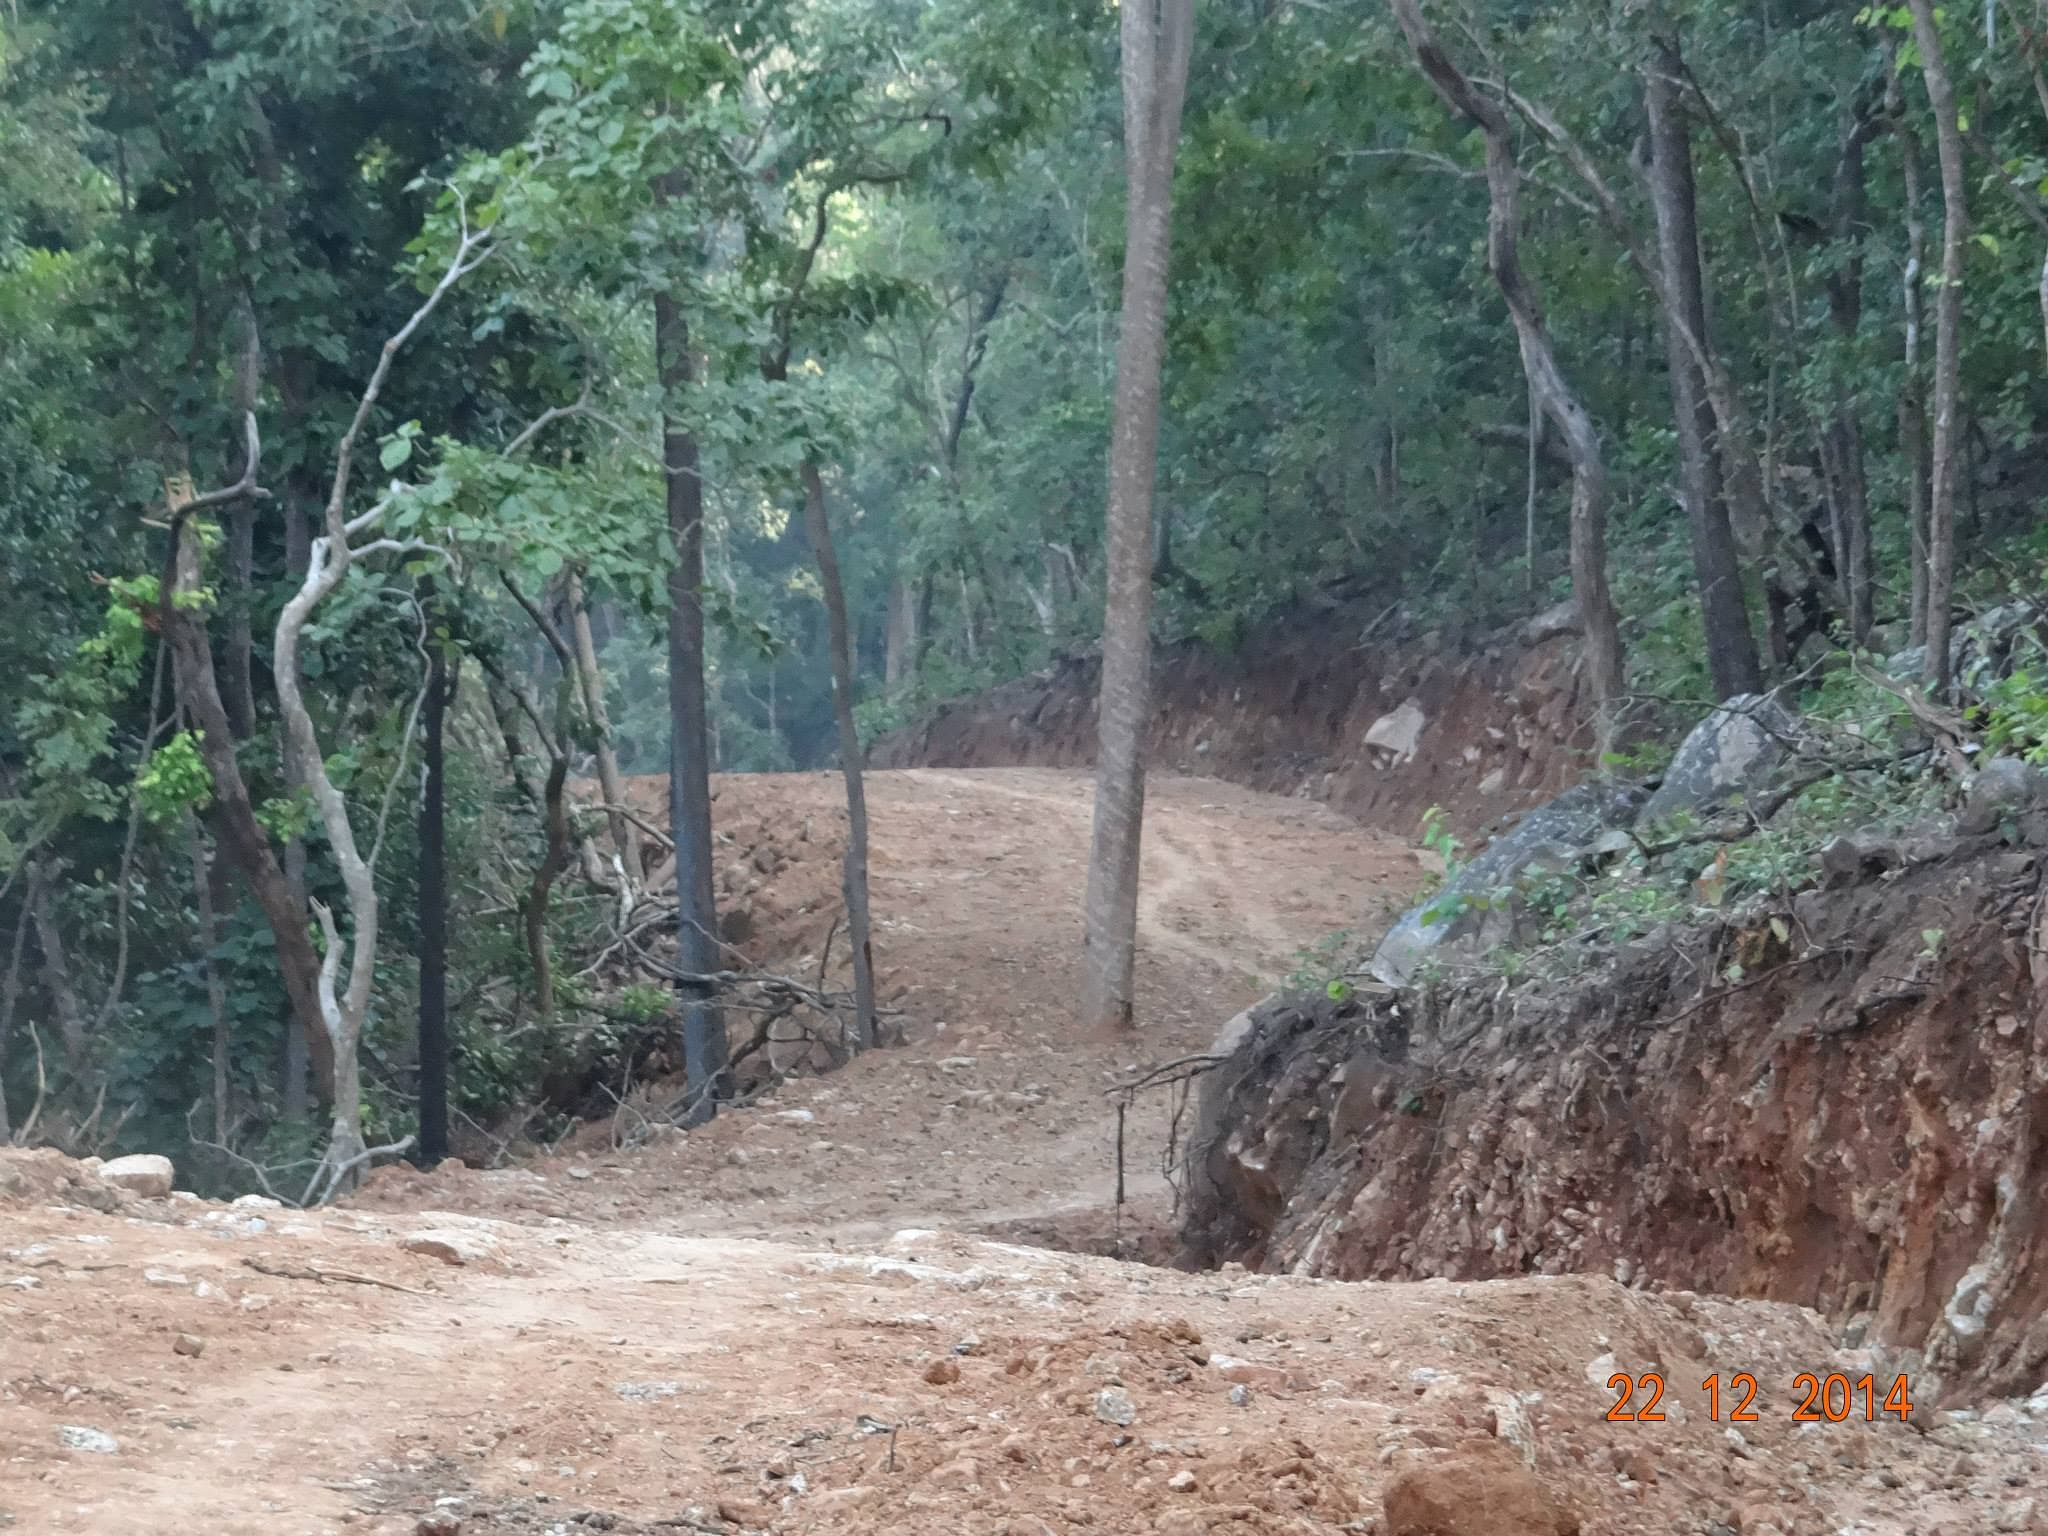 The road was cut through a ghat to the Garadama gram panchayat.